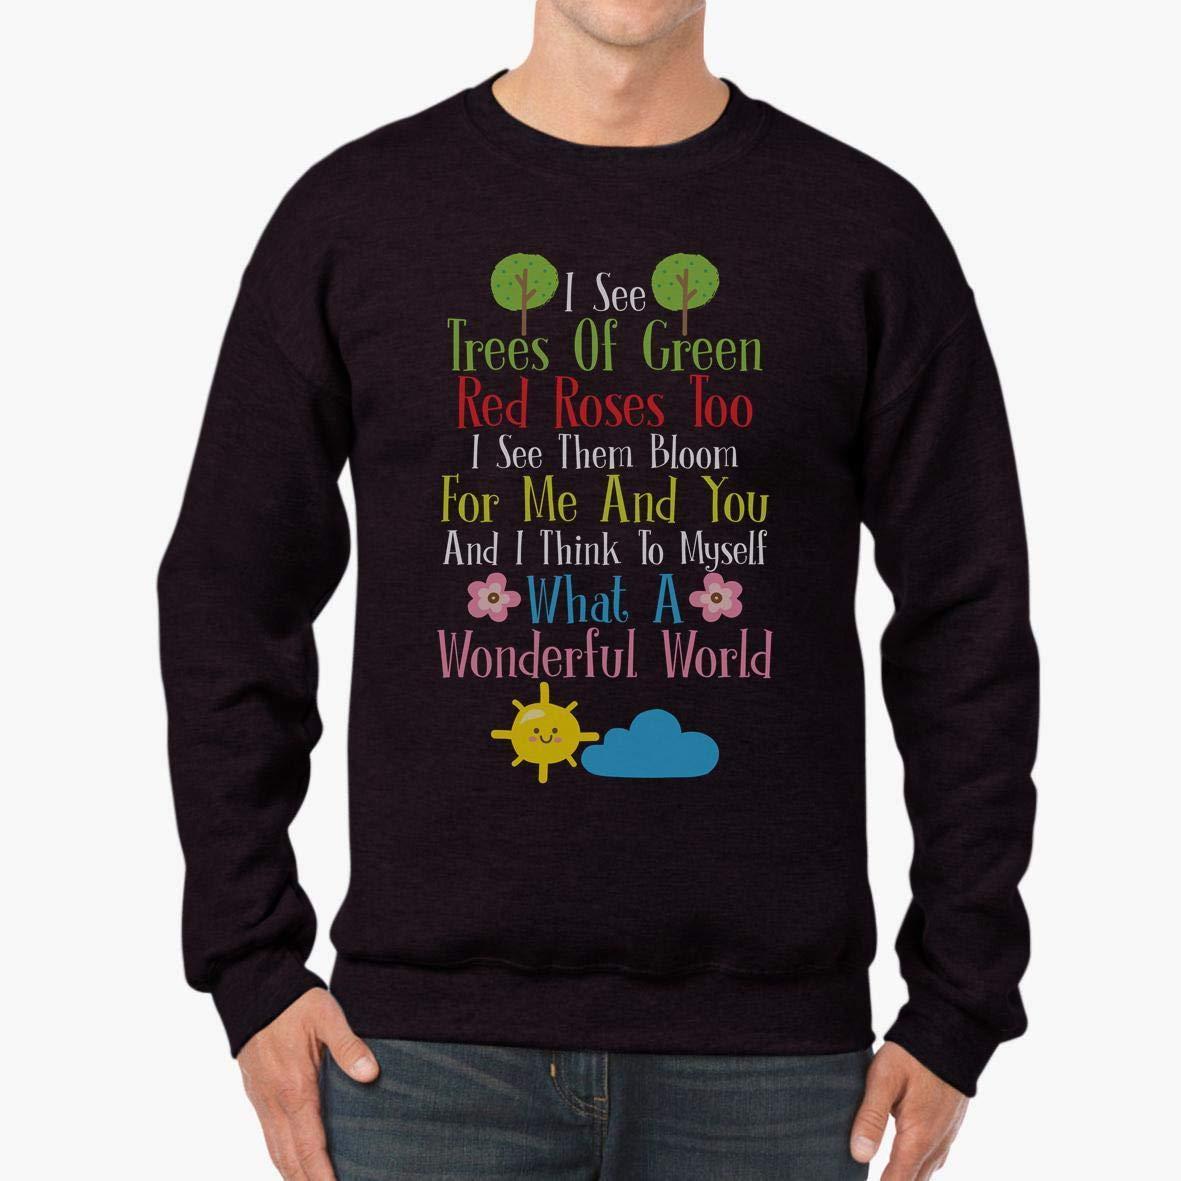 tee Myself What A Wonderful World Peace Soul Unisex Sweatshirt